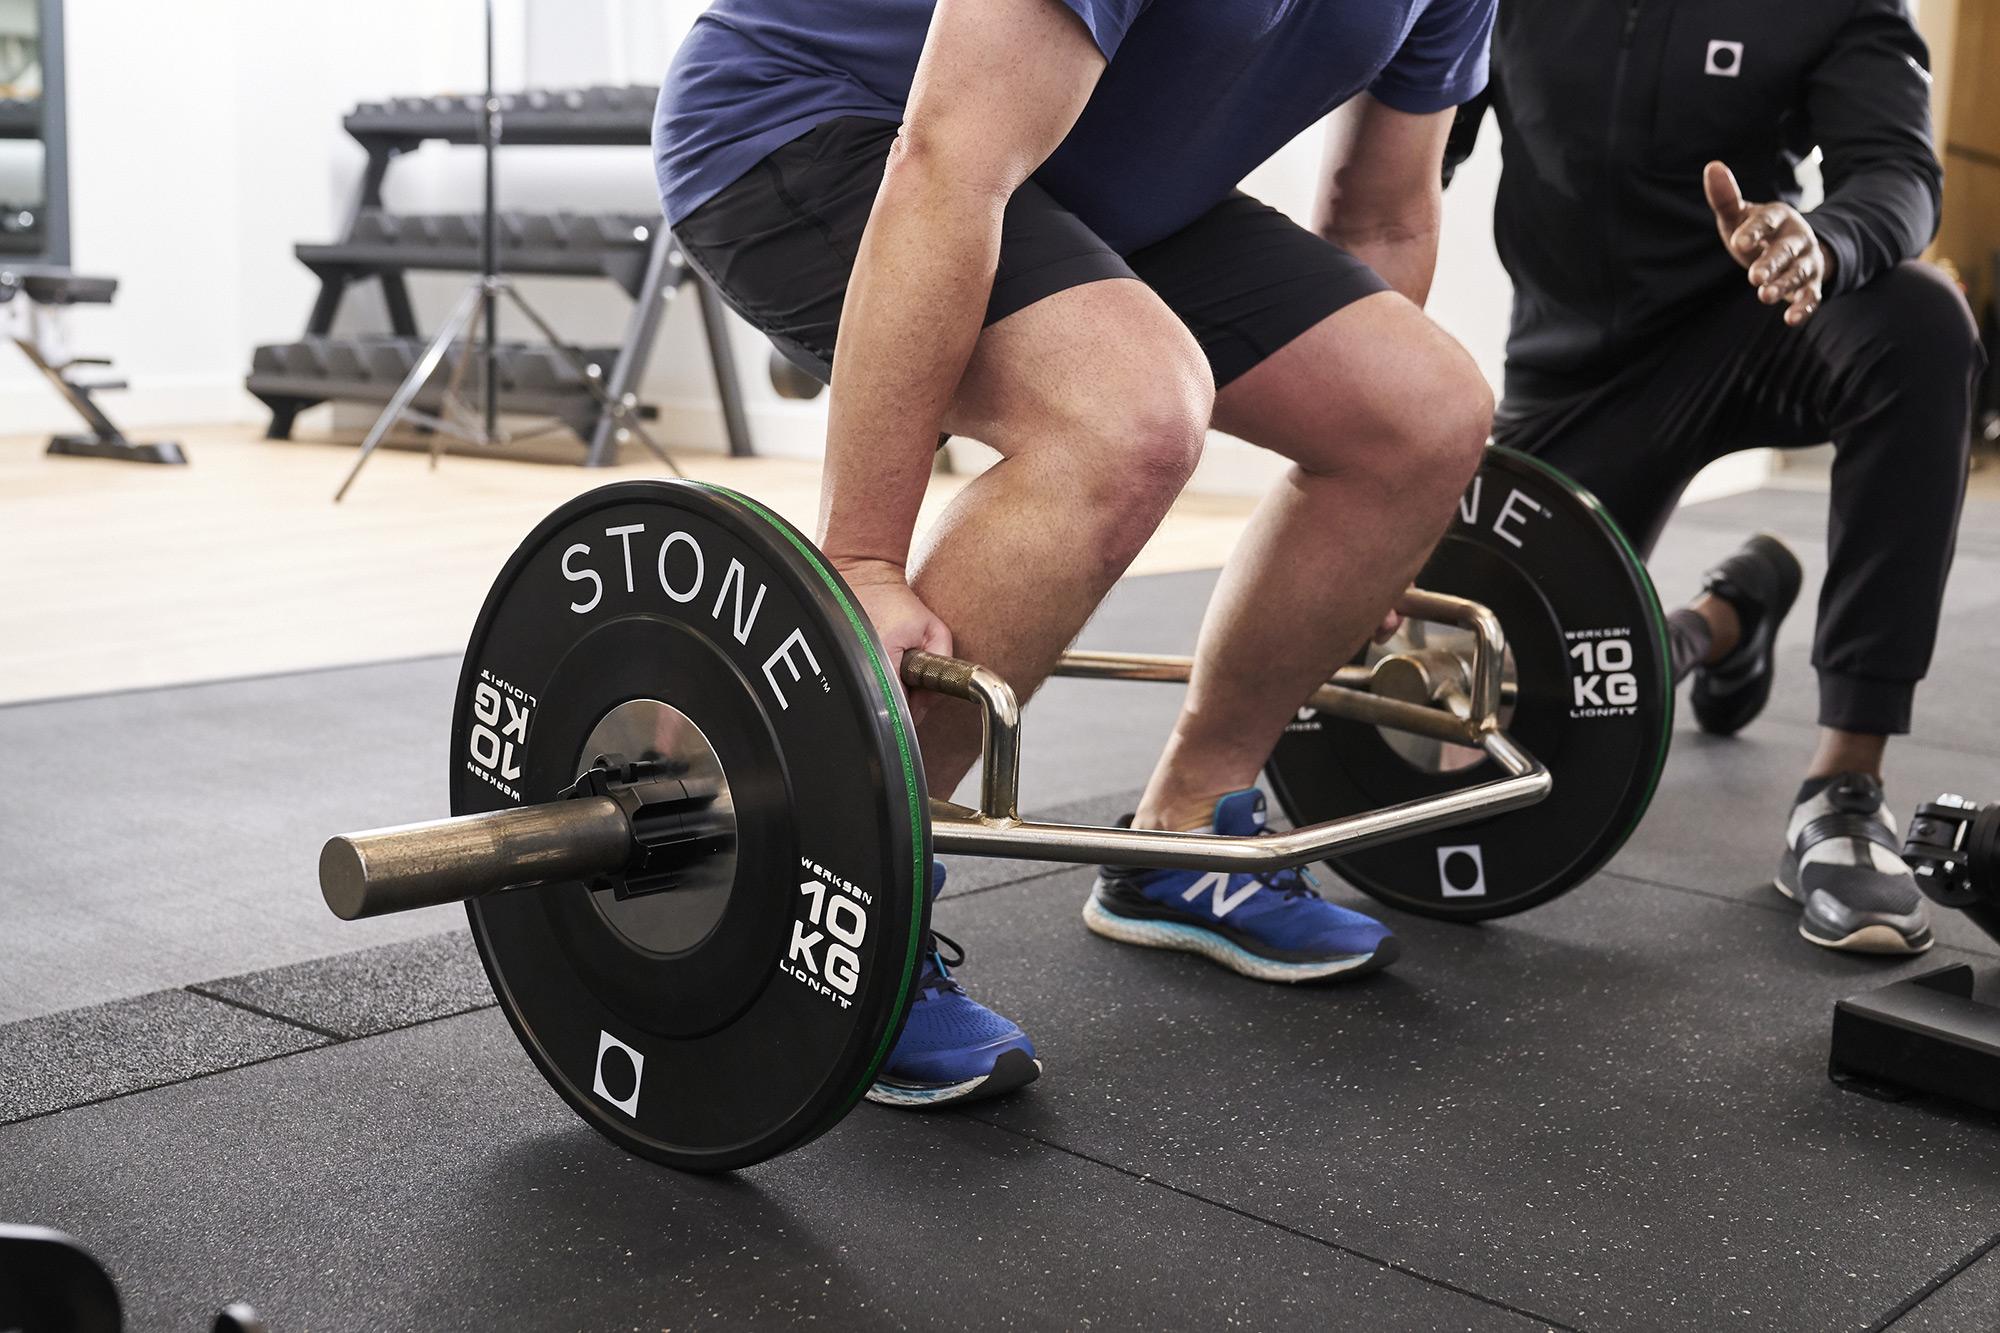 Training squats at STONE